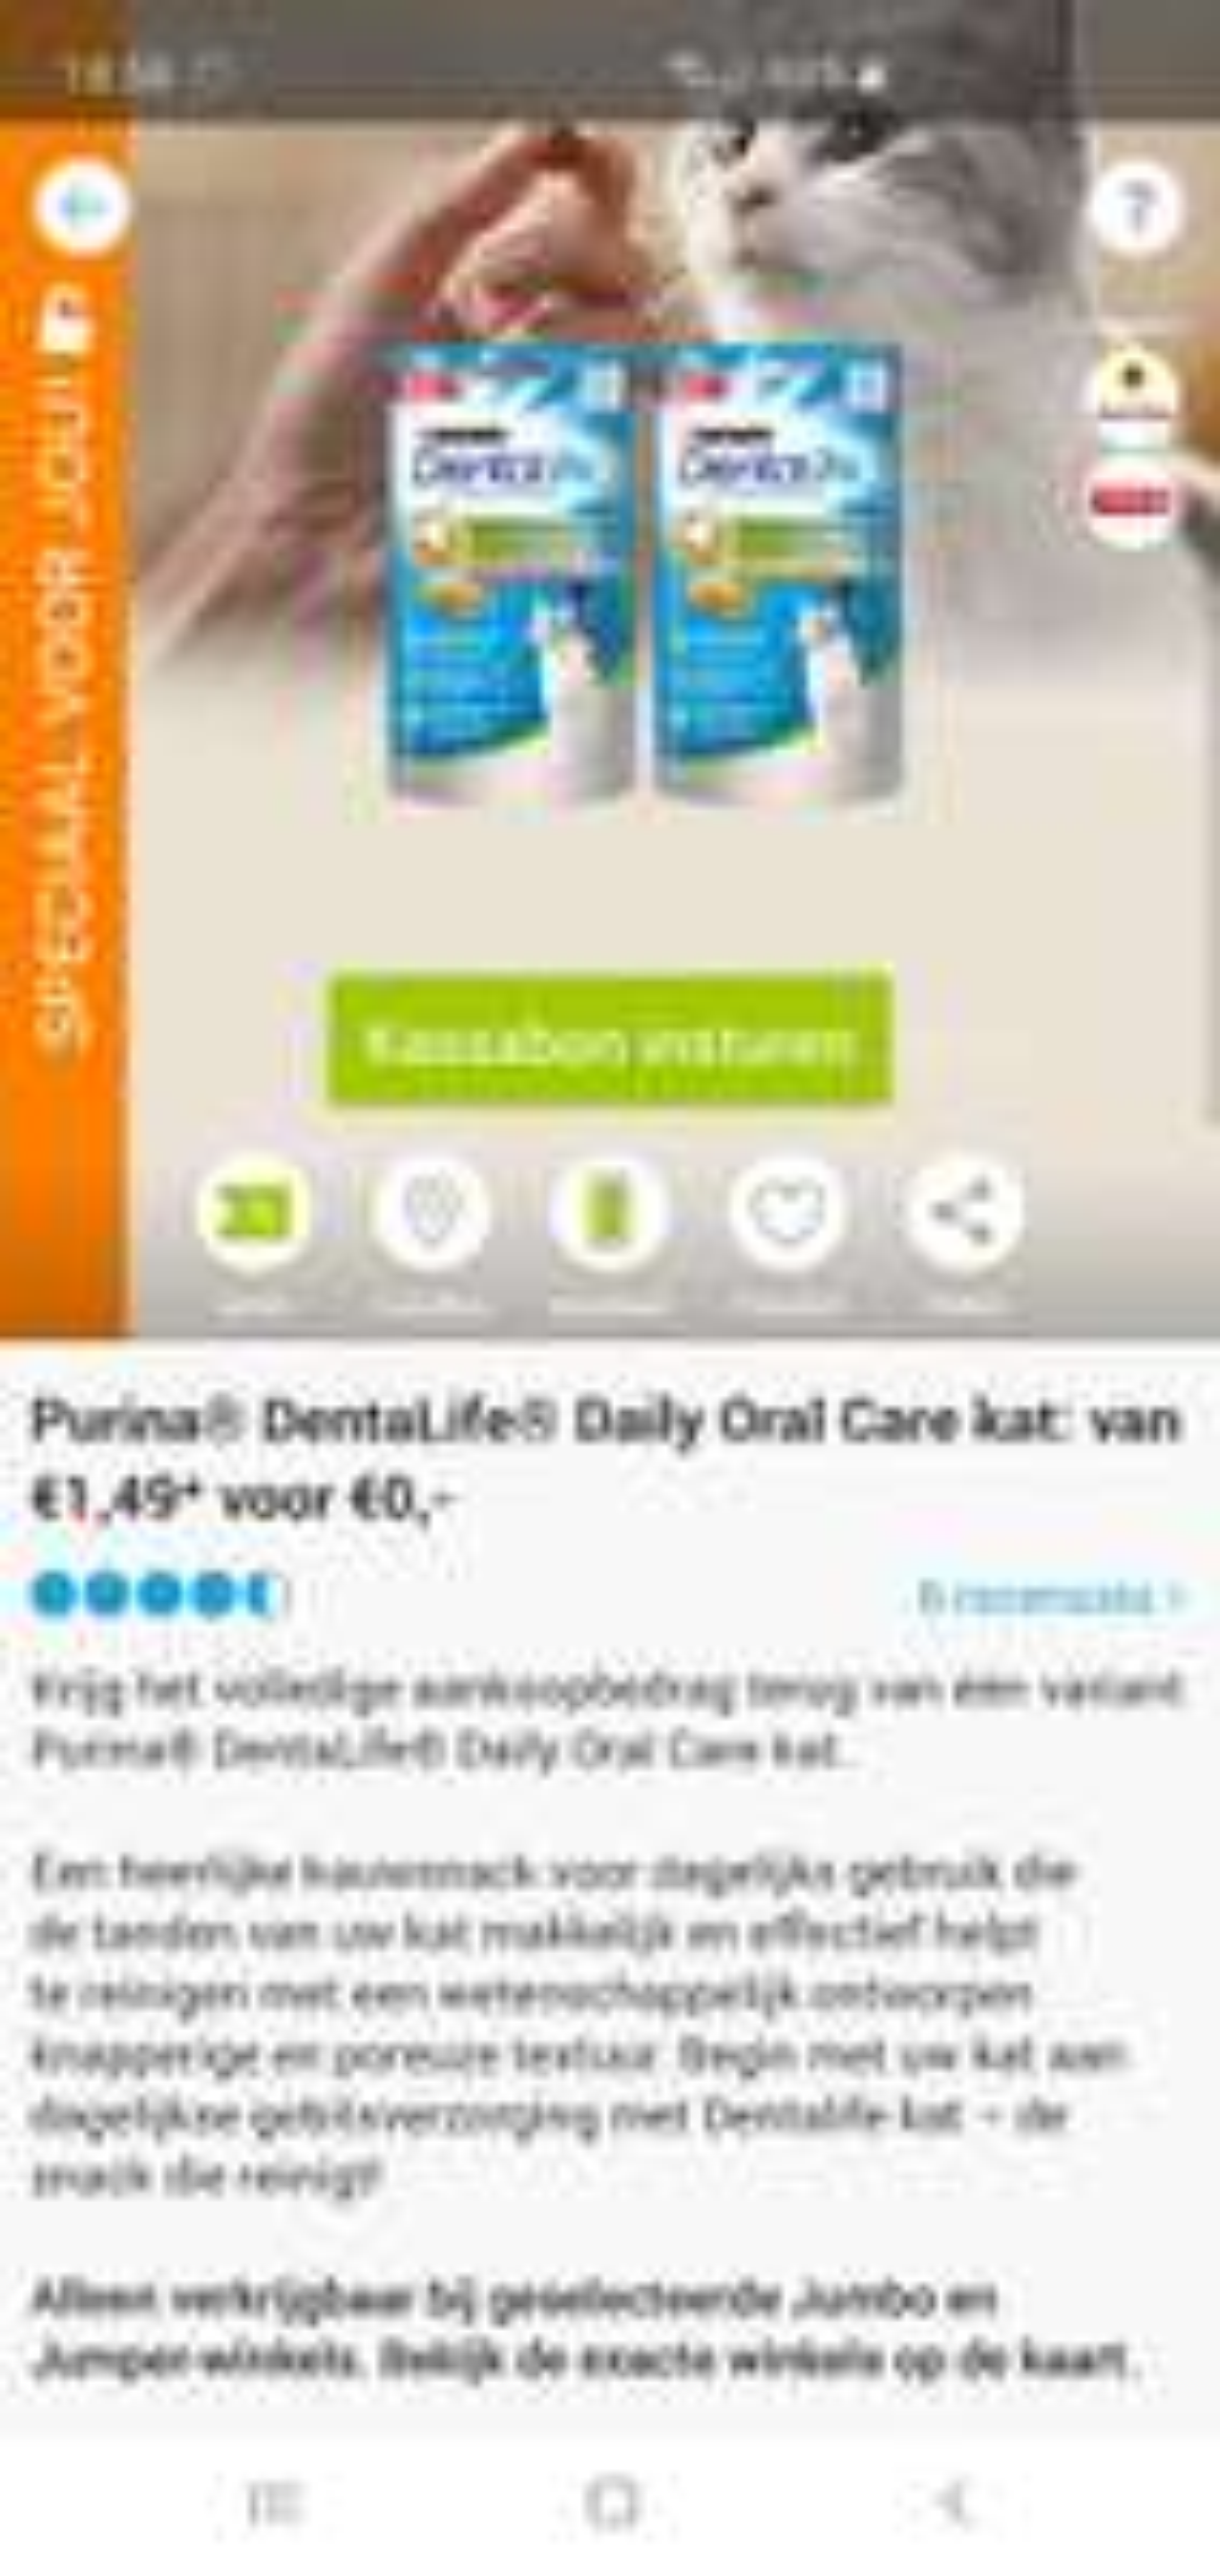 [Persoonlijk] Gratis Purina Dentalife Daily Oral Care Kat @Scoupy